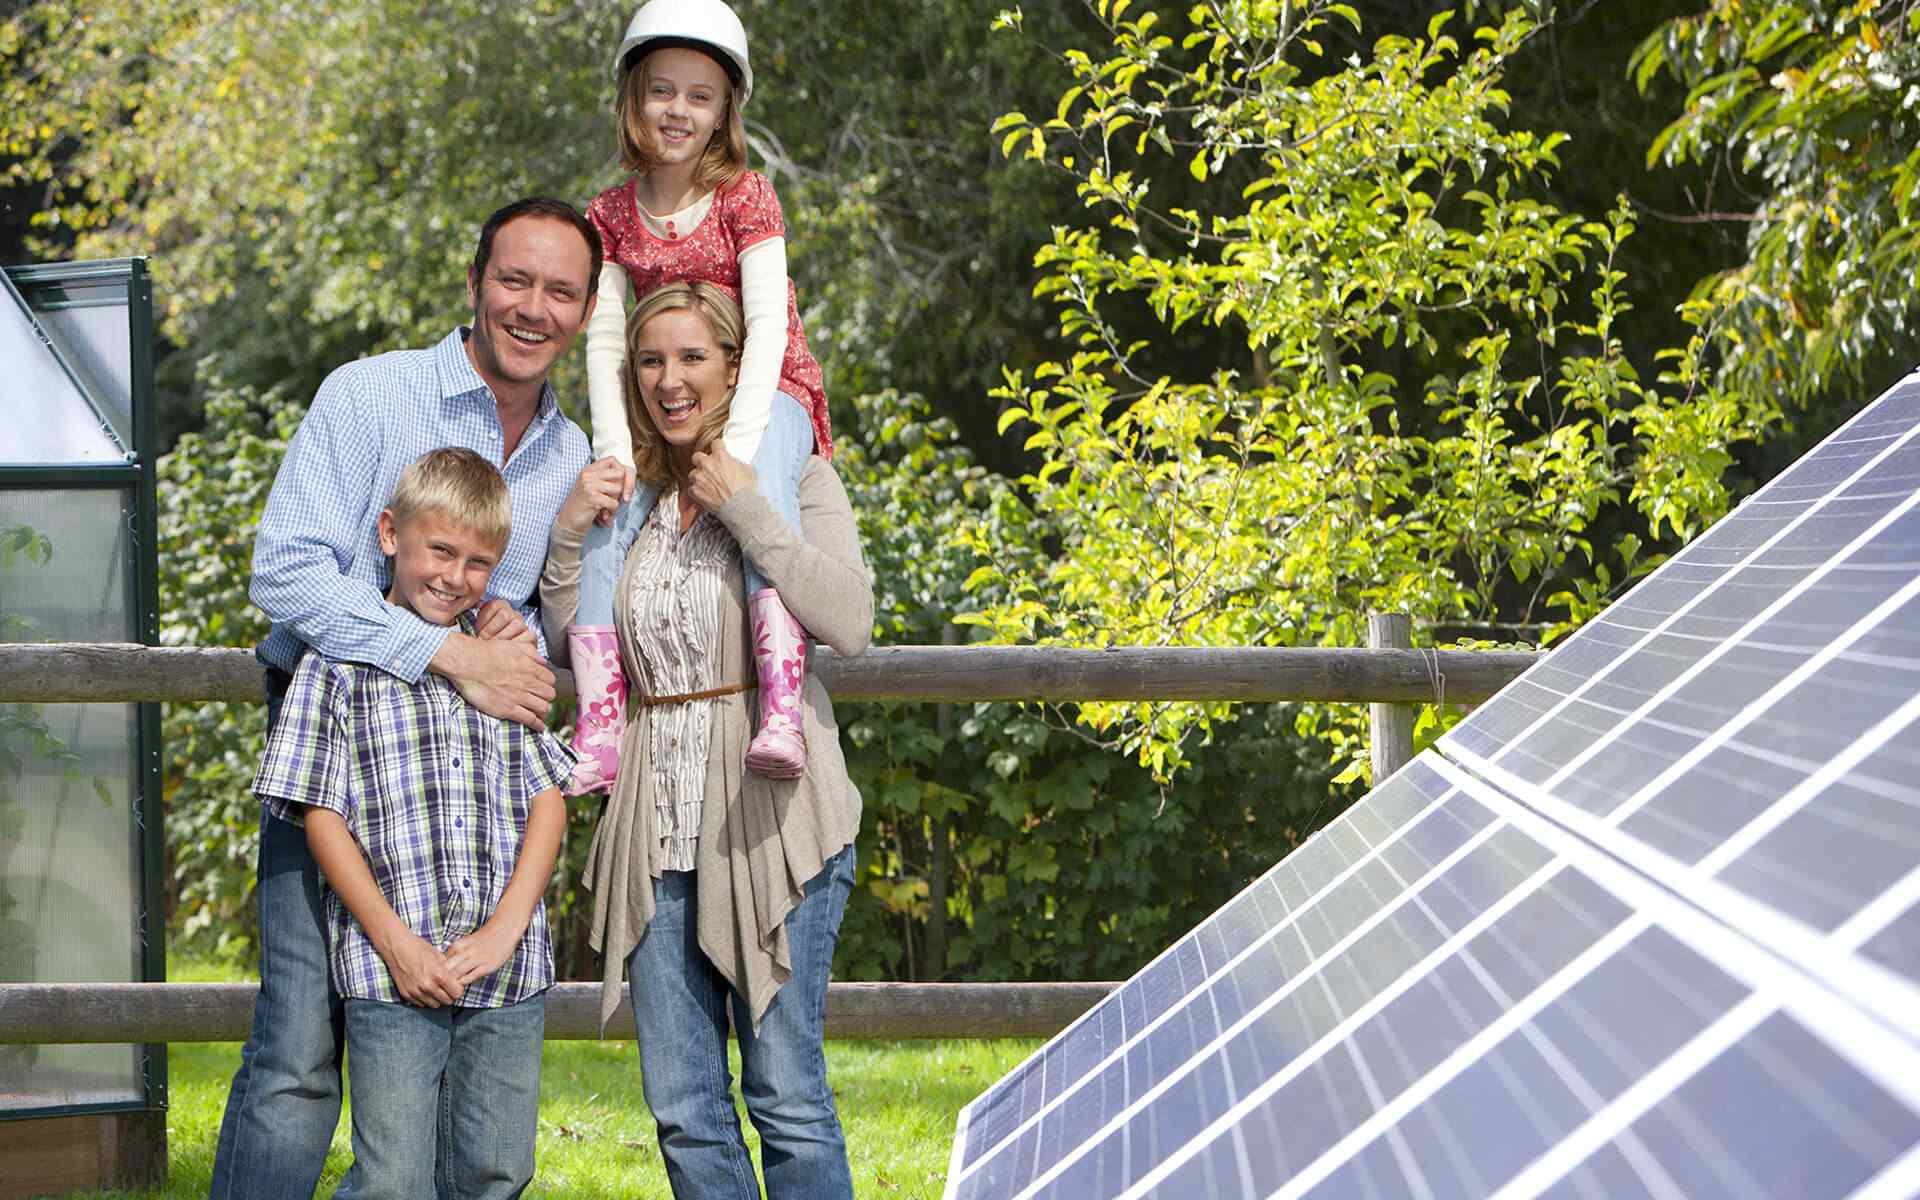 https://lasvegas-solarpanels.com/wp-content/uploads/2018/09/post_04.jpg